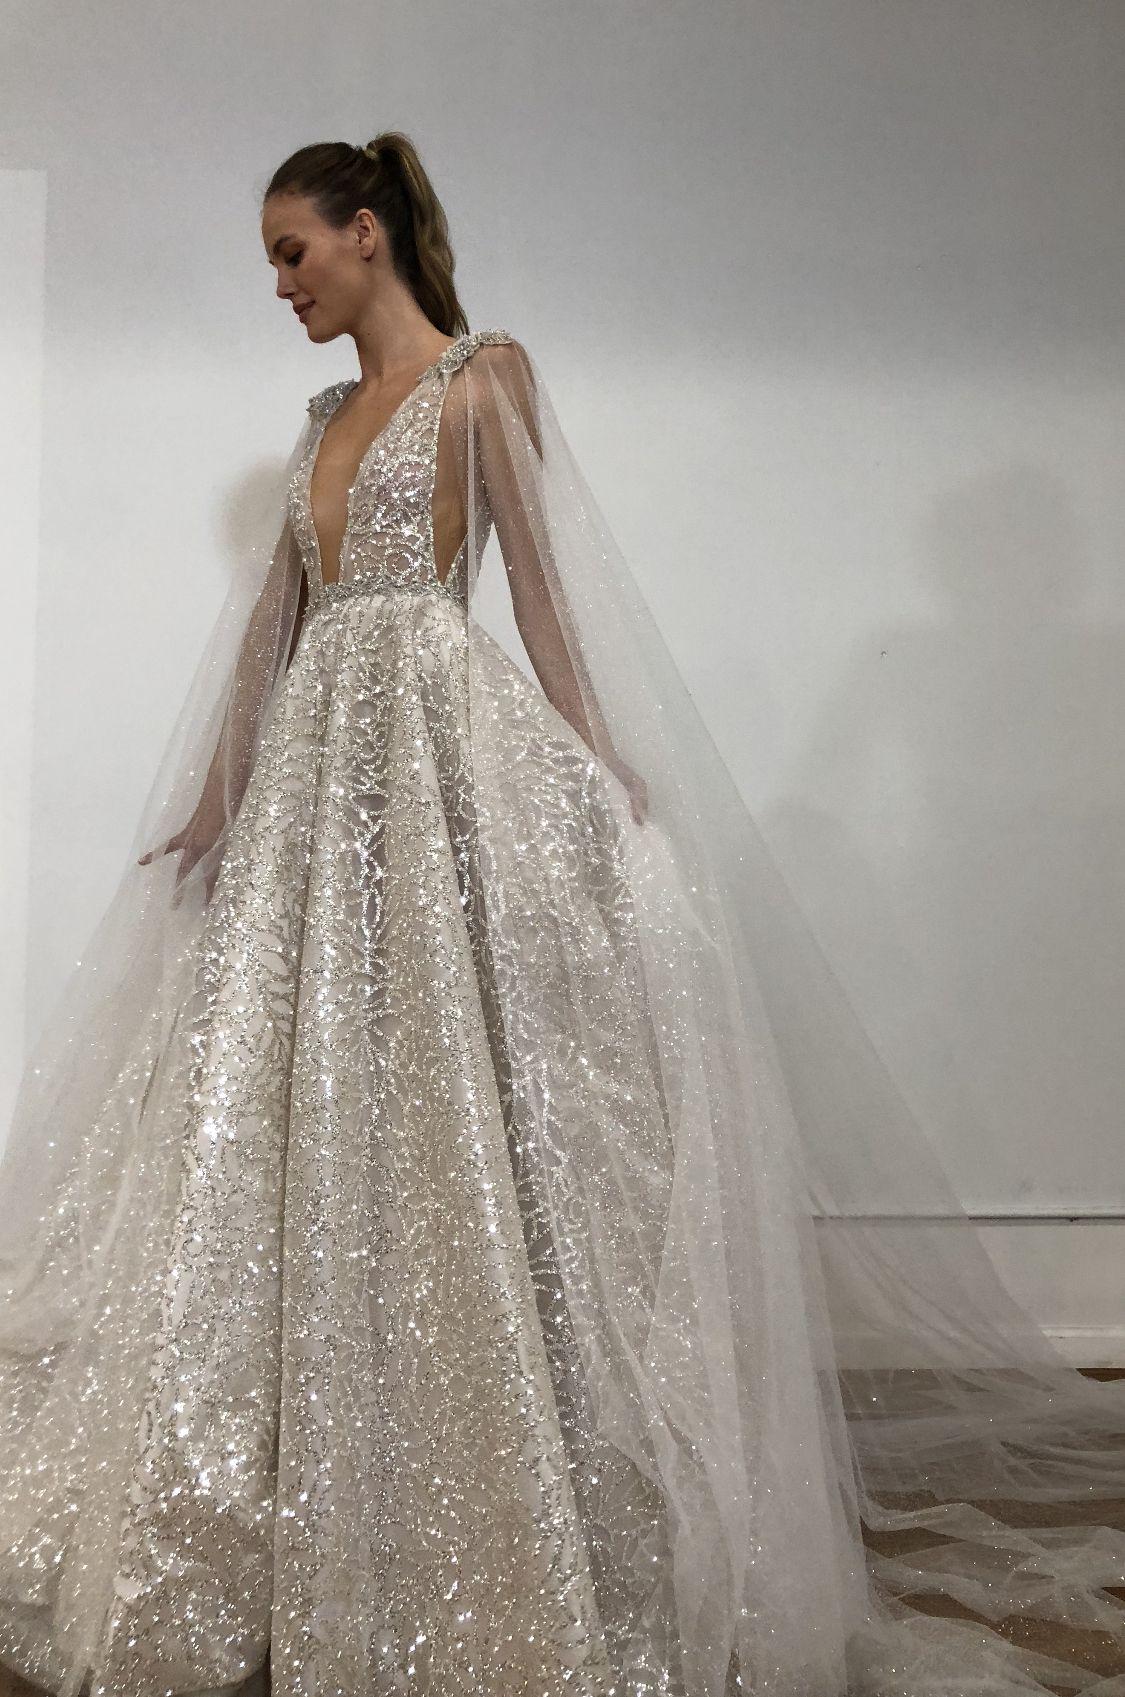 Berta Sparkle On Your Day Sparkle Wedding Dress Glittery Wedding Dress Wedding Dresses [ 1697 x 1125 Pixel ]